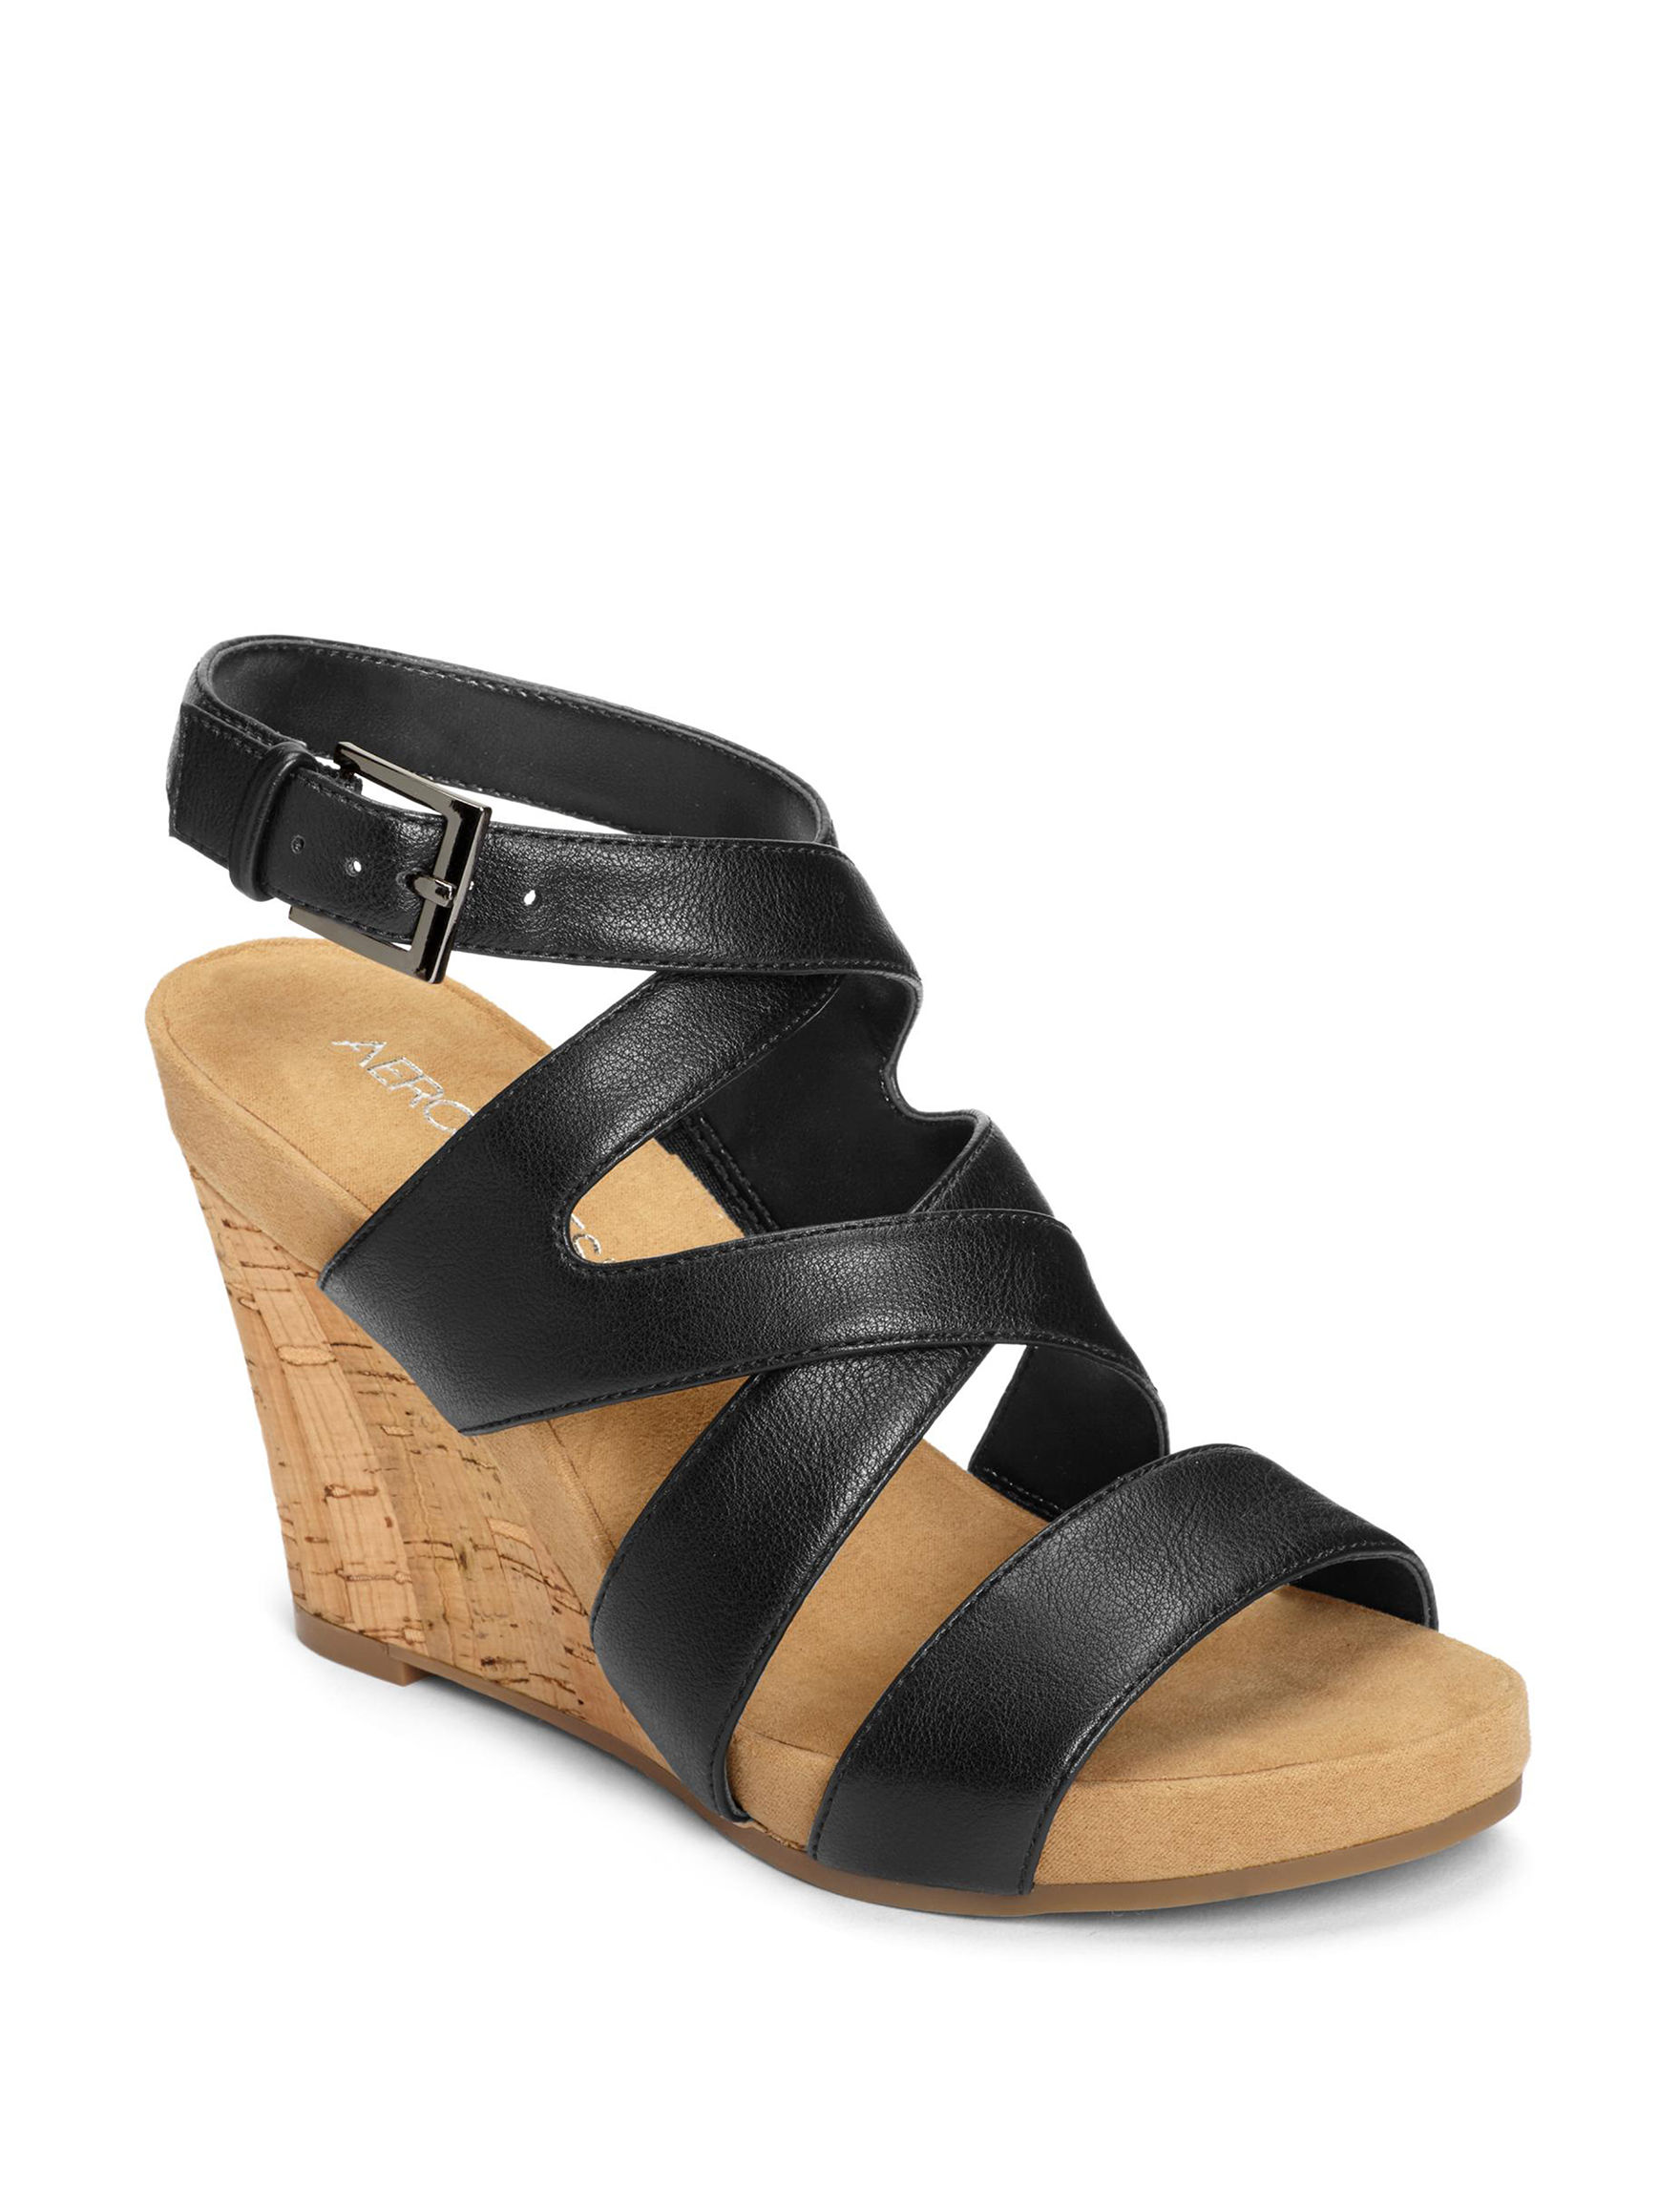 28e683fd03 Aerosoles Women's Silver Plush Cork Wedge Sandals | Stage Stores